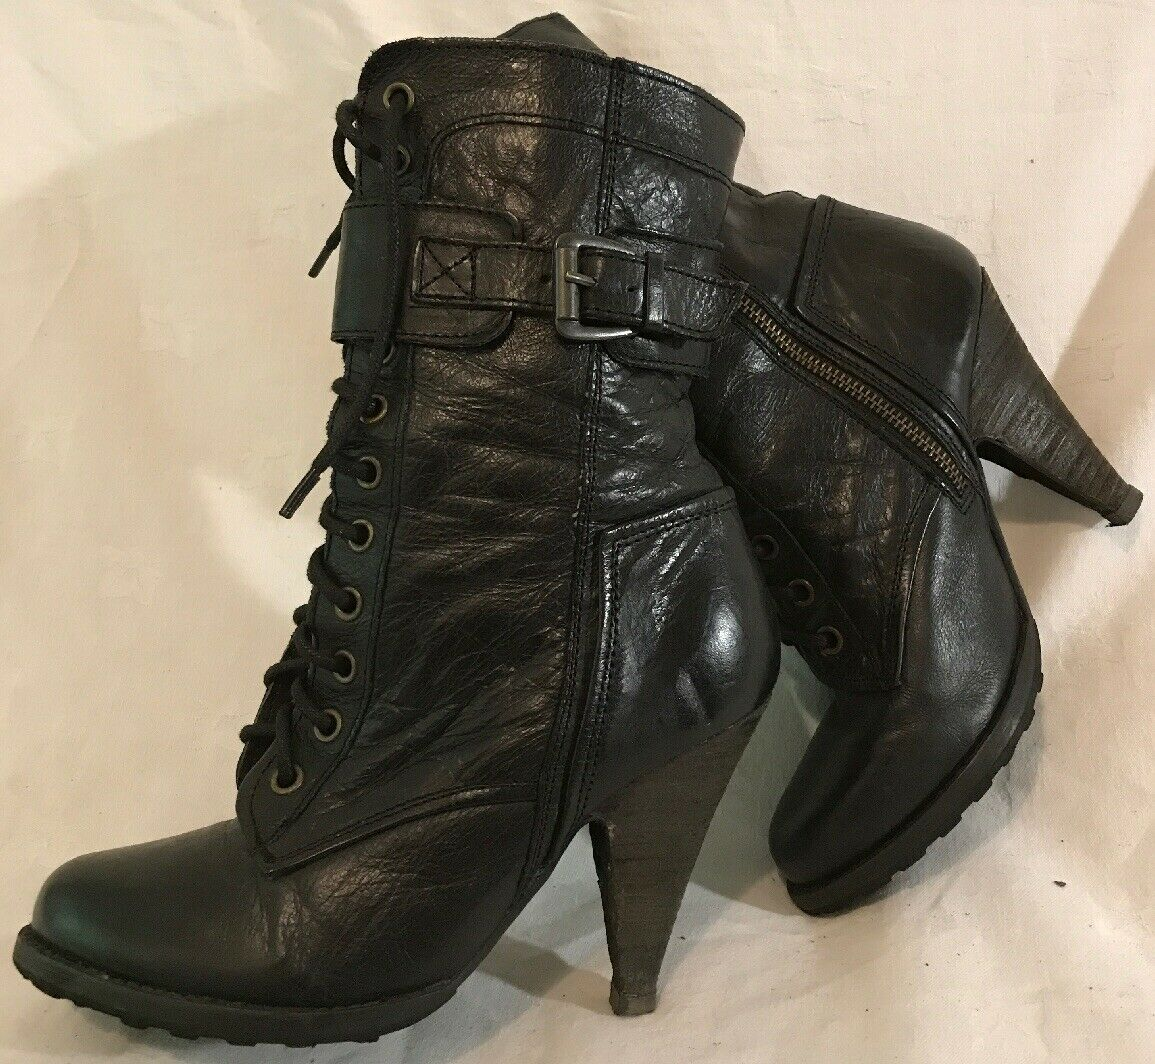 Urban Vintage Black Mid Calf Leather Lovely Boots Size 5 (482v)